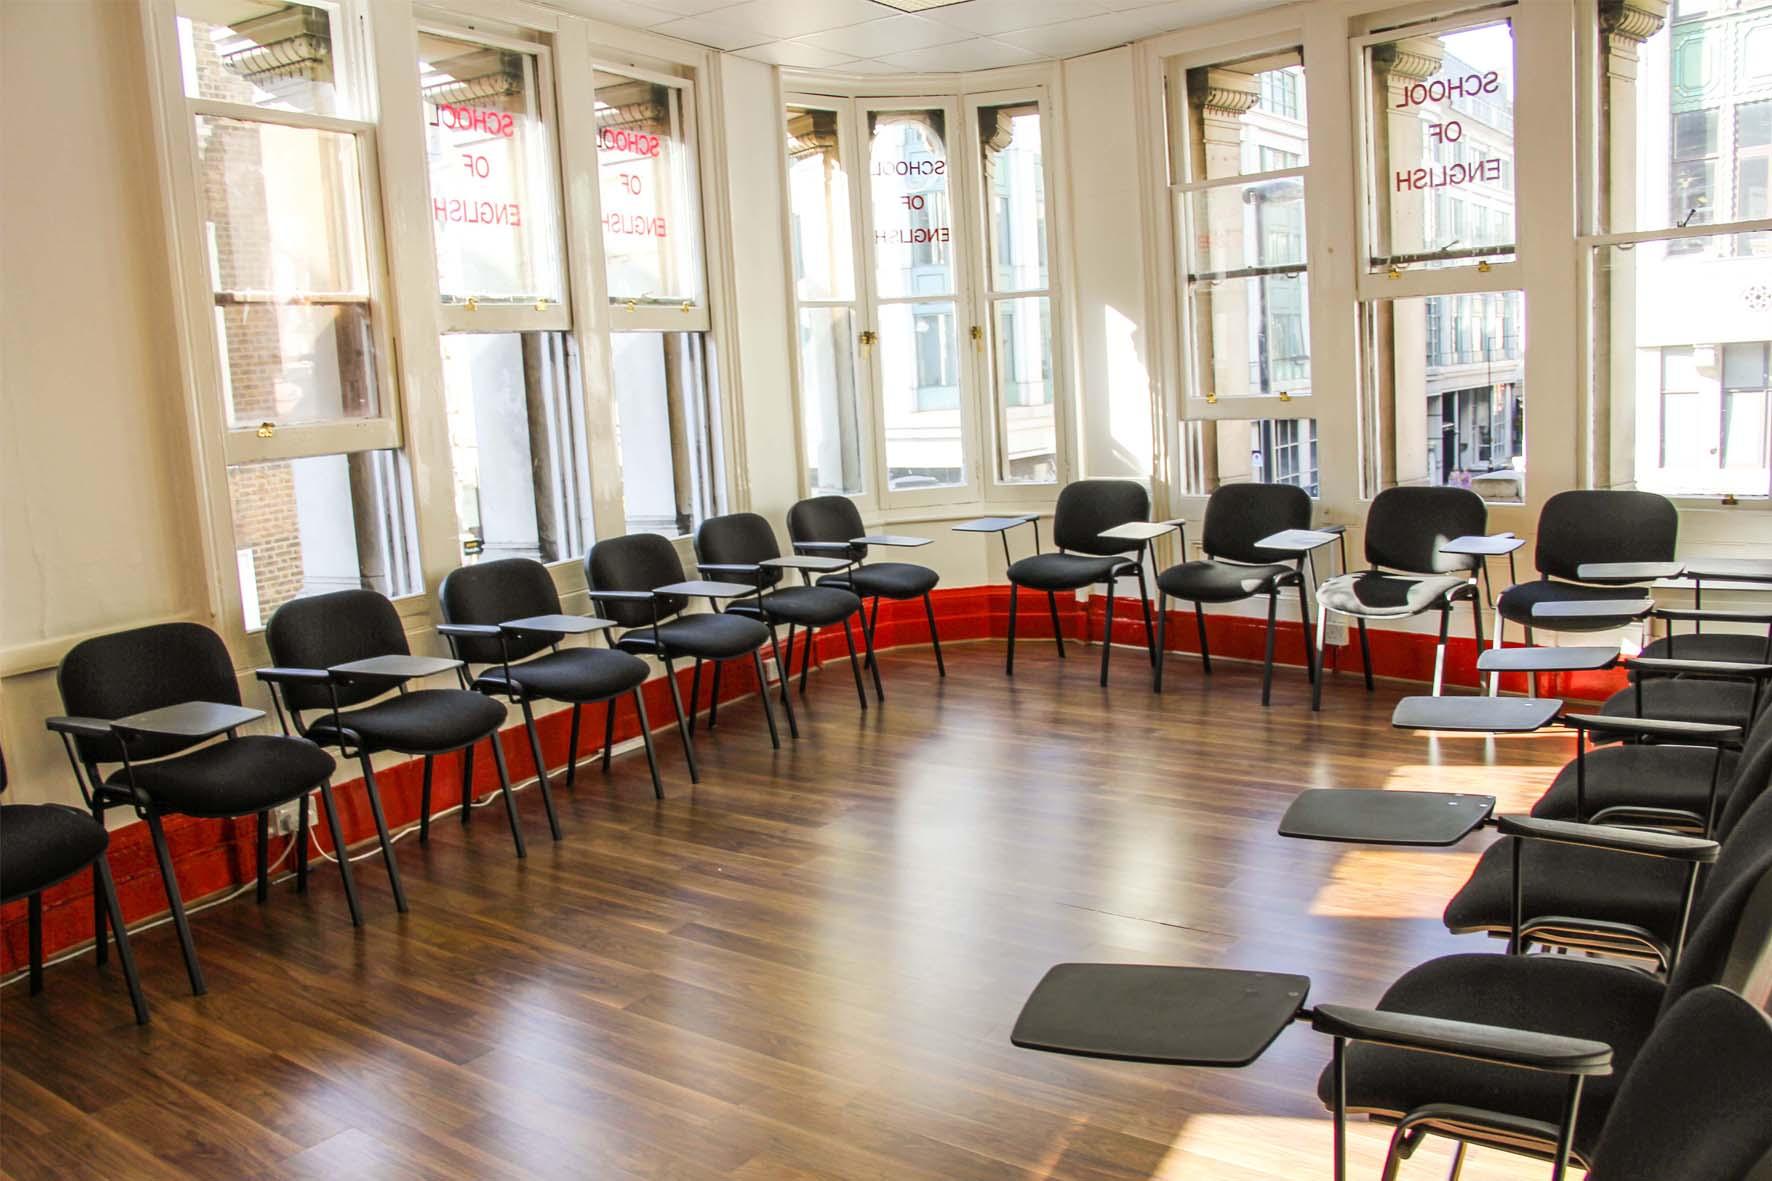 English Courses London Oxford Street